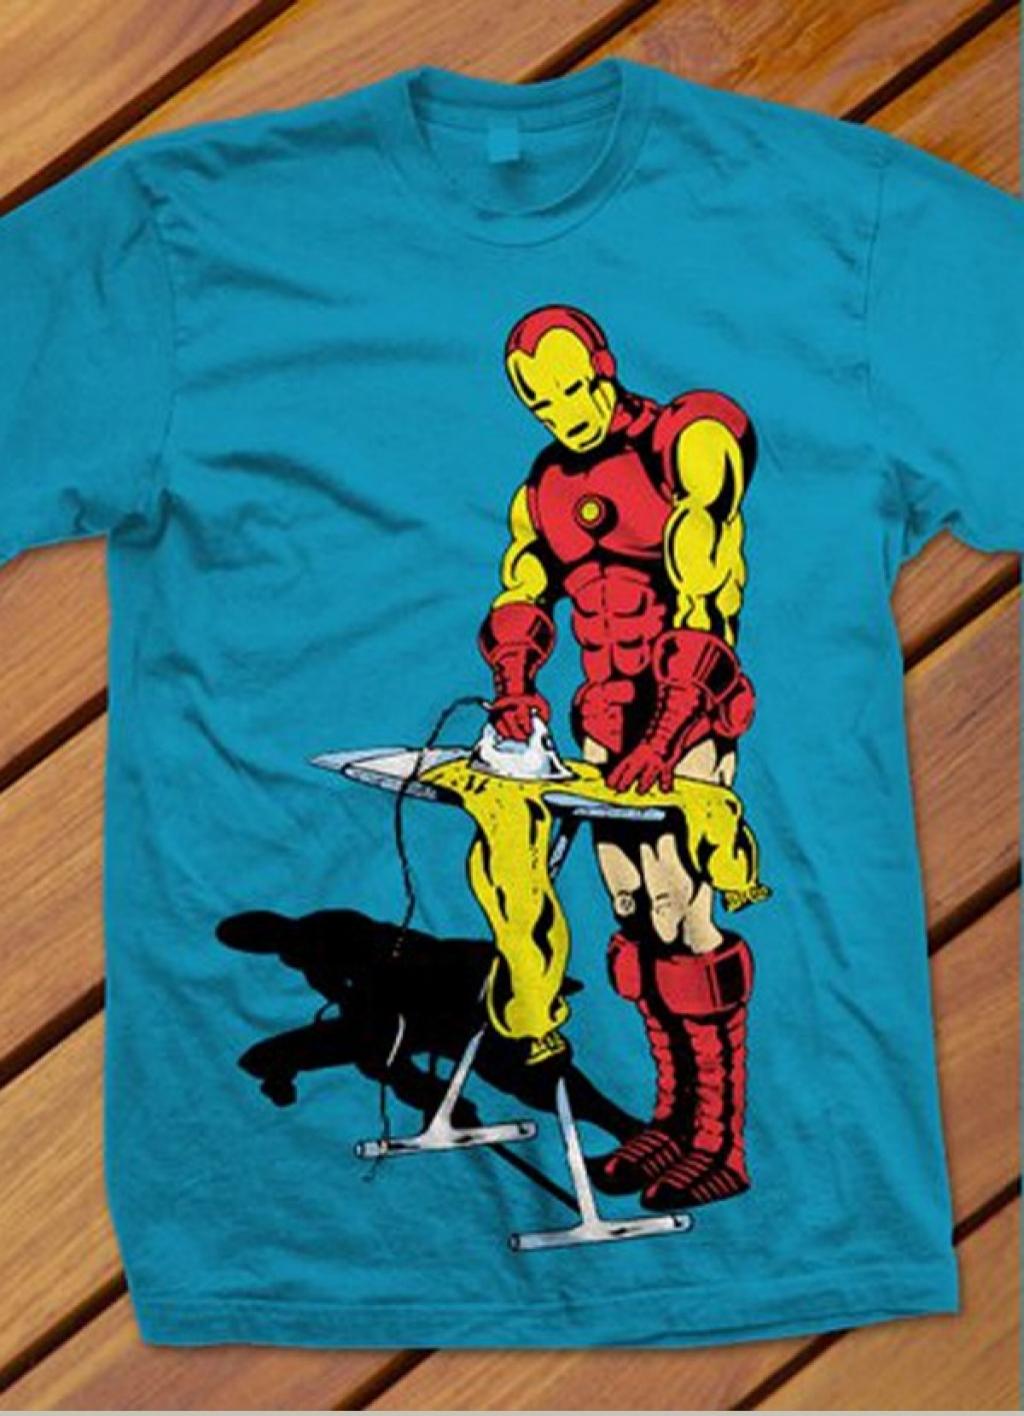 15106829040_uth-oye-ironman-tshirt.jpeg